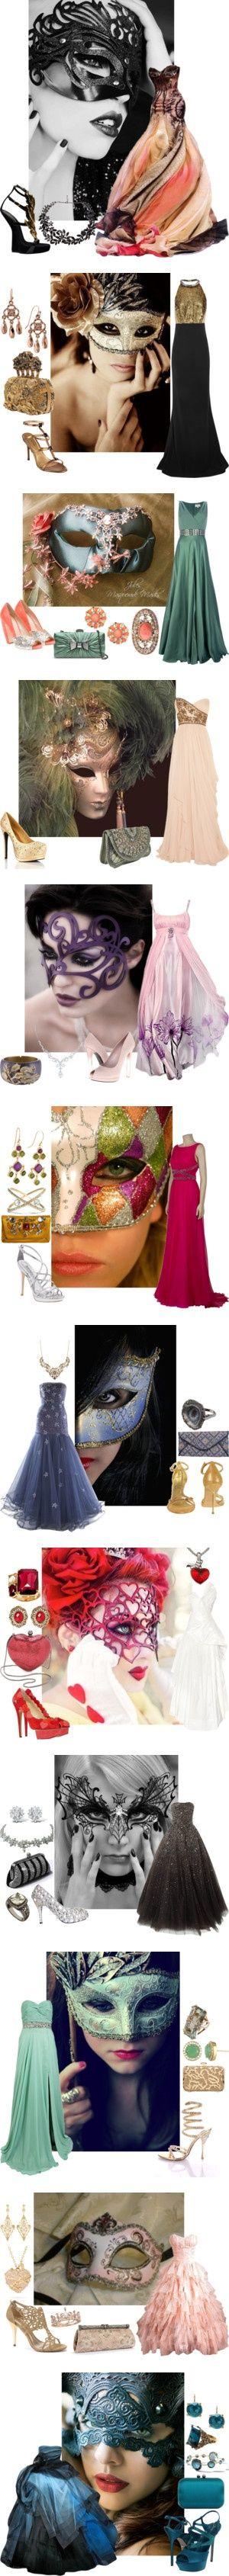 Dress up for masquerade party - Perfect Ideas For A Masquerade Ball